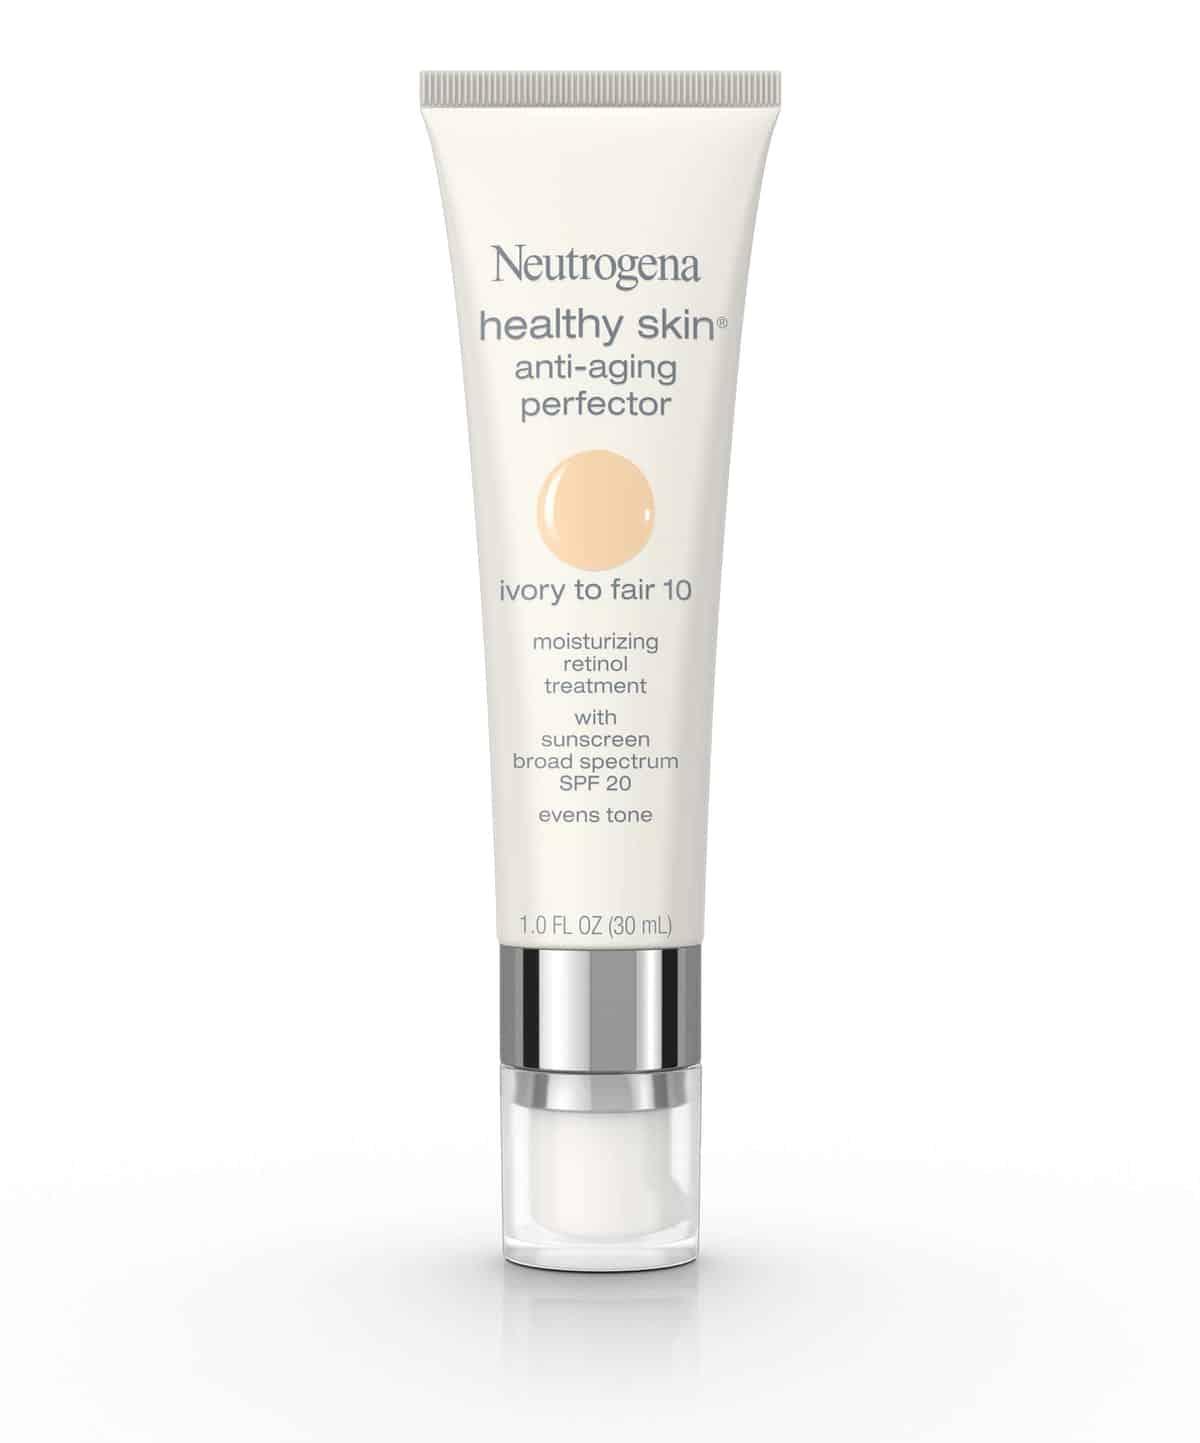 Neutrogena Healthy Skin Anti Aging Perfector Spf 20